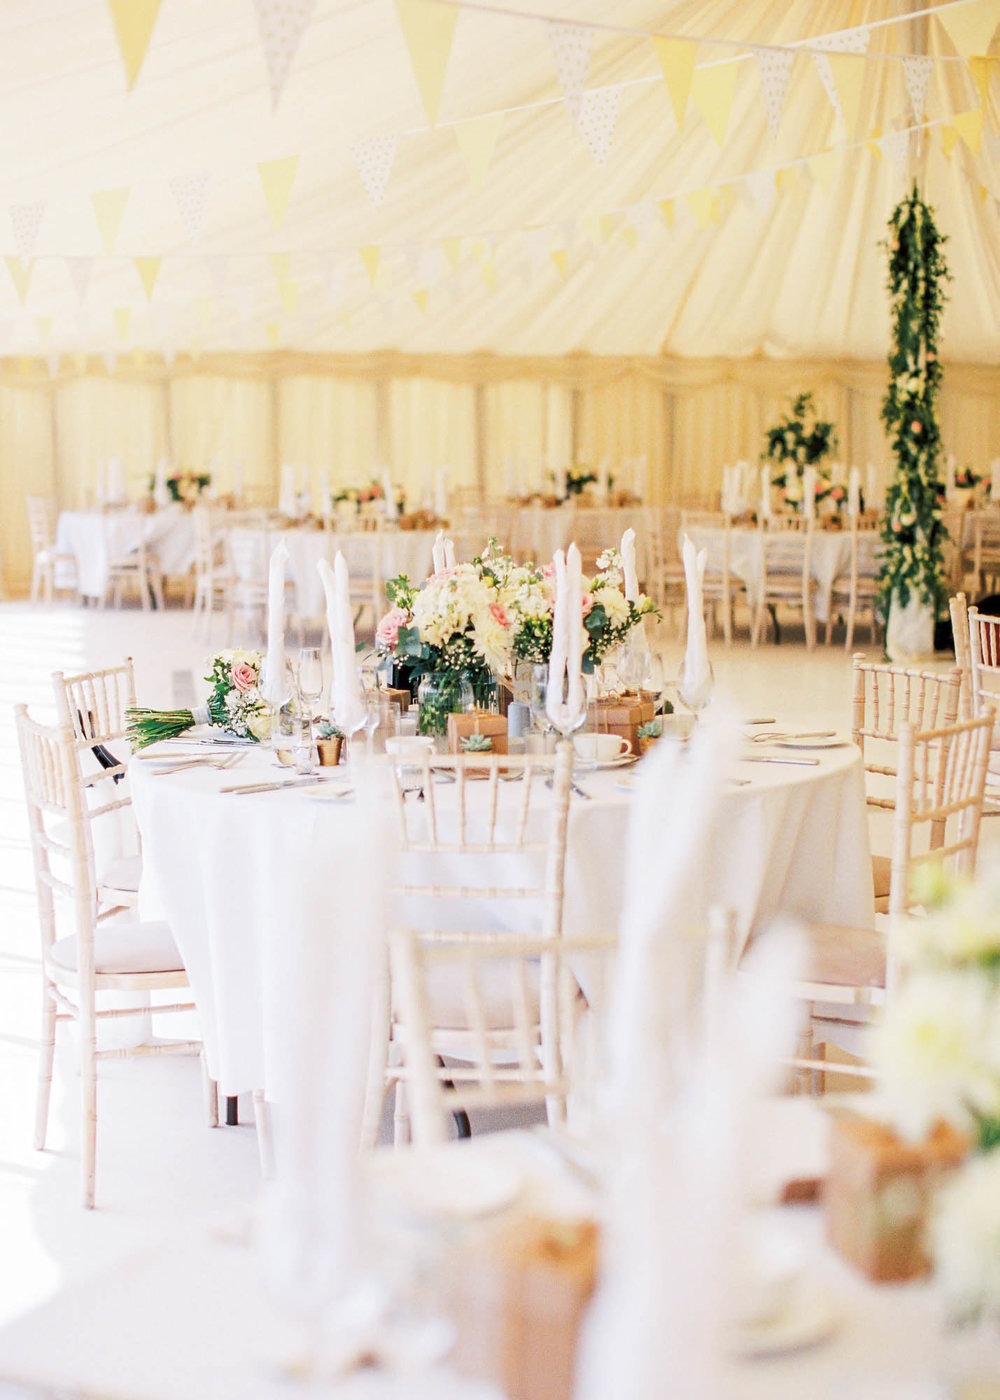 Amy O'Boyle Photography- Destination & UK Fine Art Film Wedding Photographer- Brickendonbury Estate Wedding-33.jpg